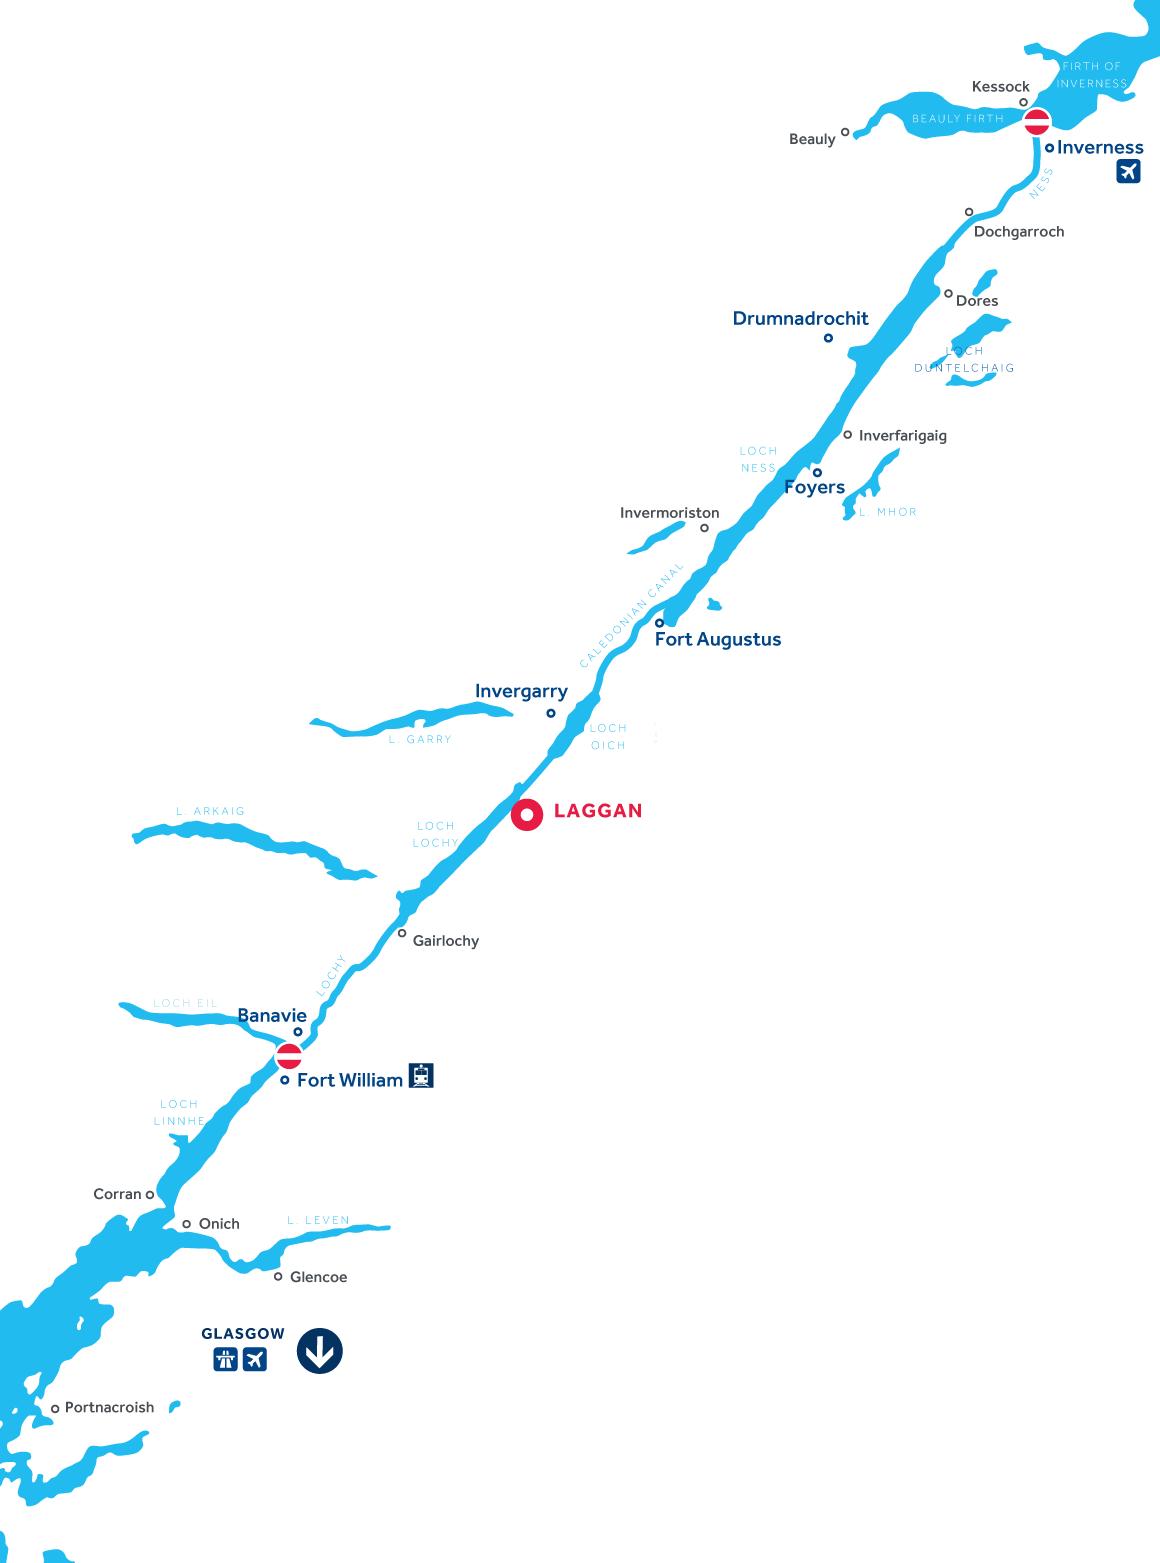 Mappa: Canale di Caledonia